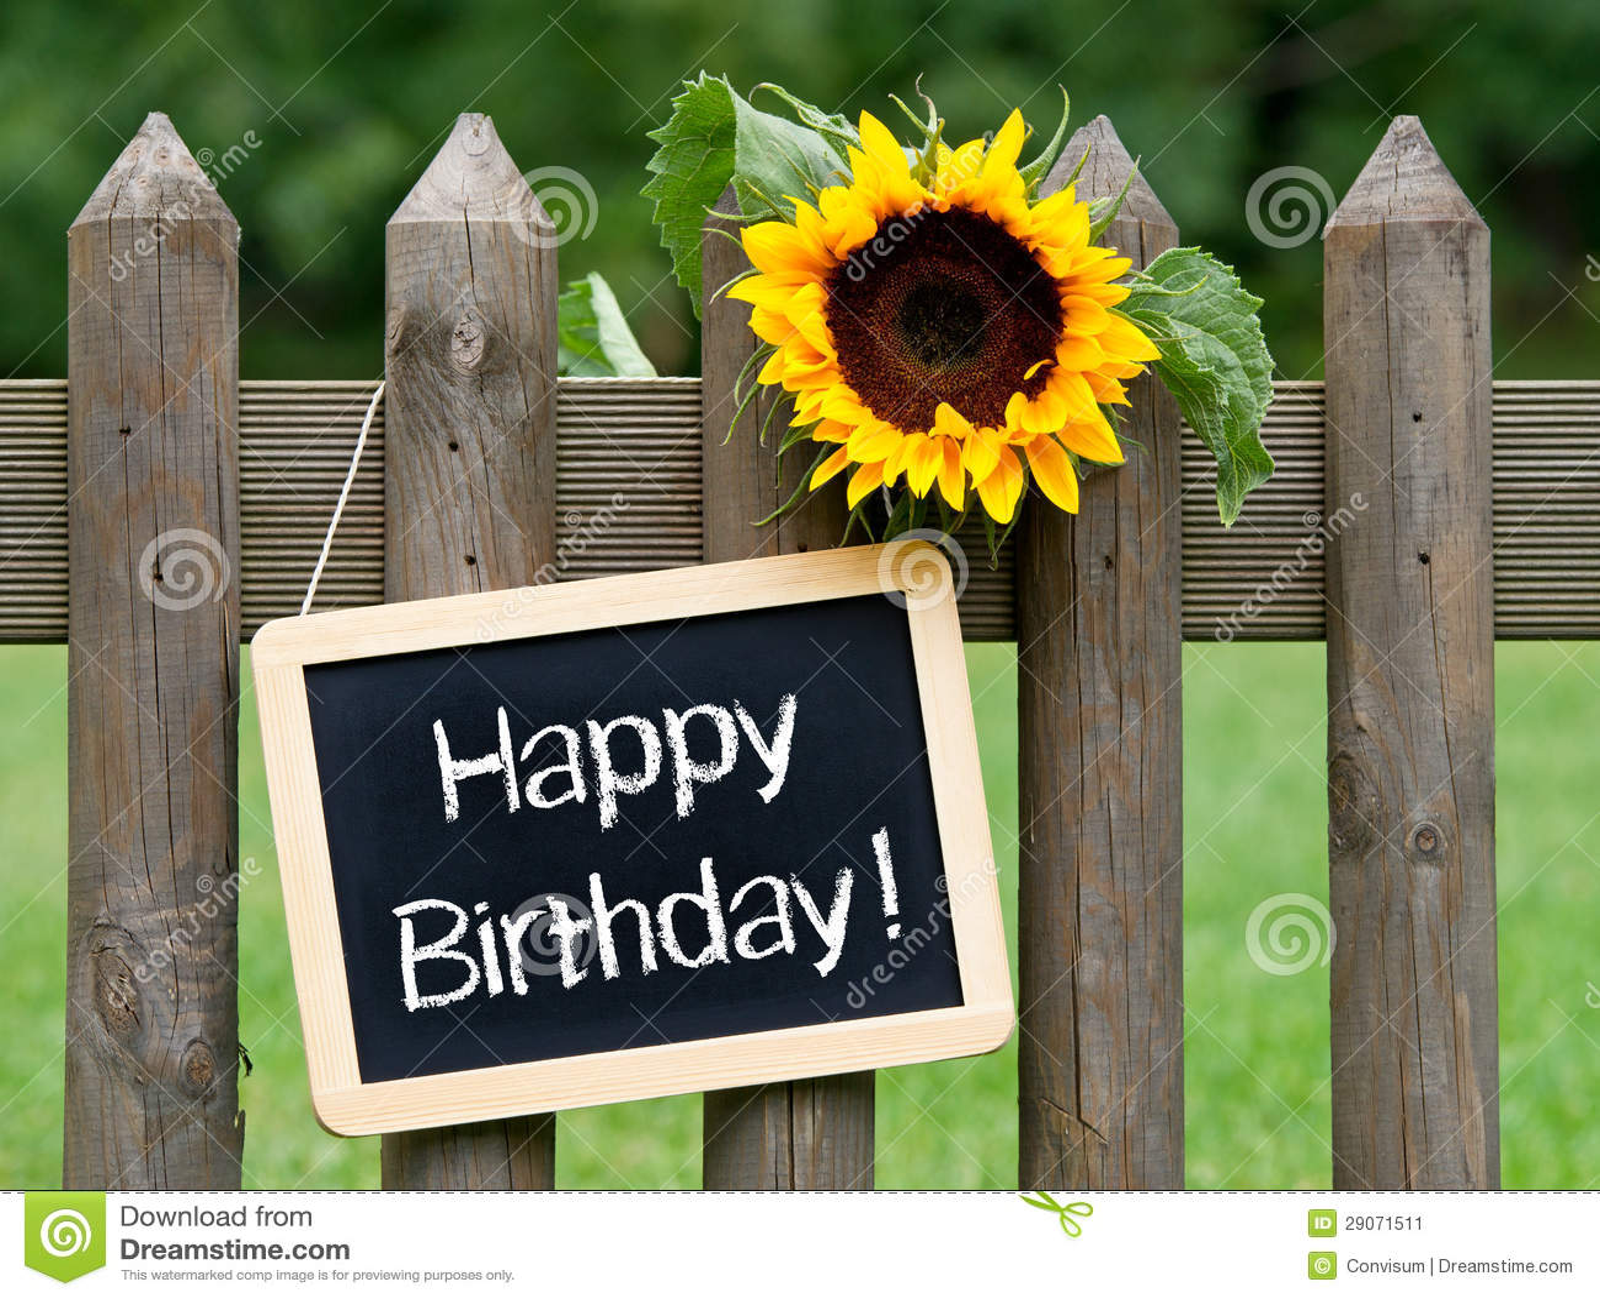 Happy Birthday Chalkboard Sign